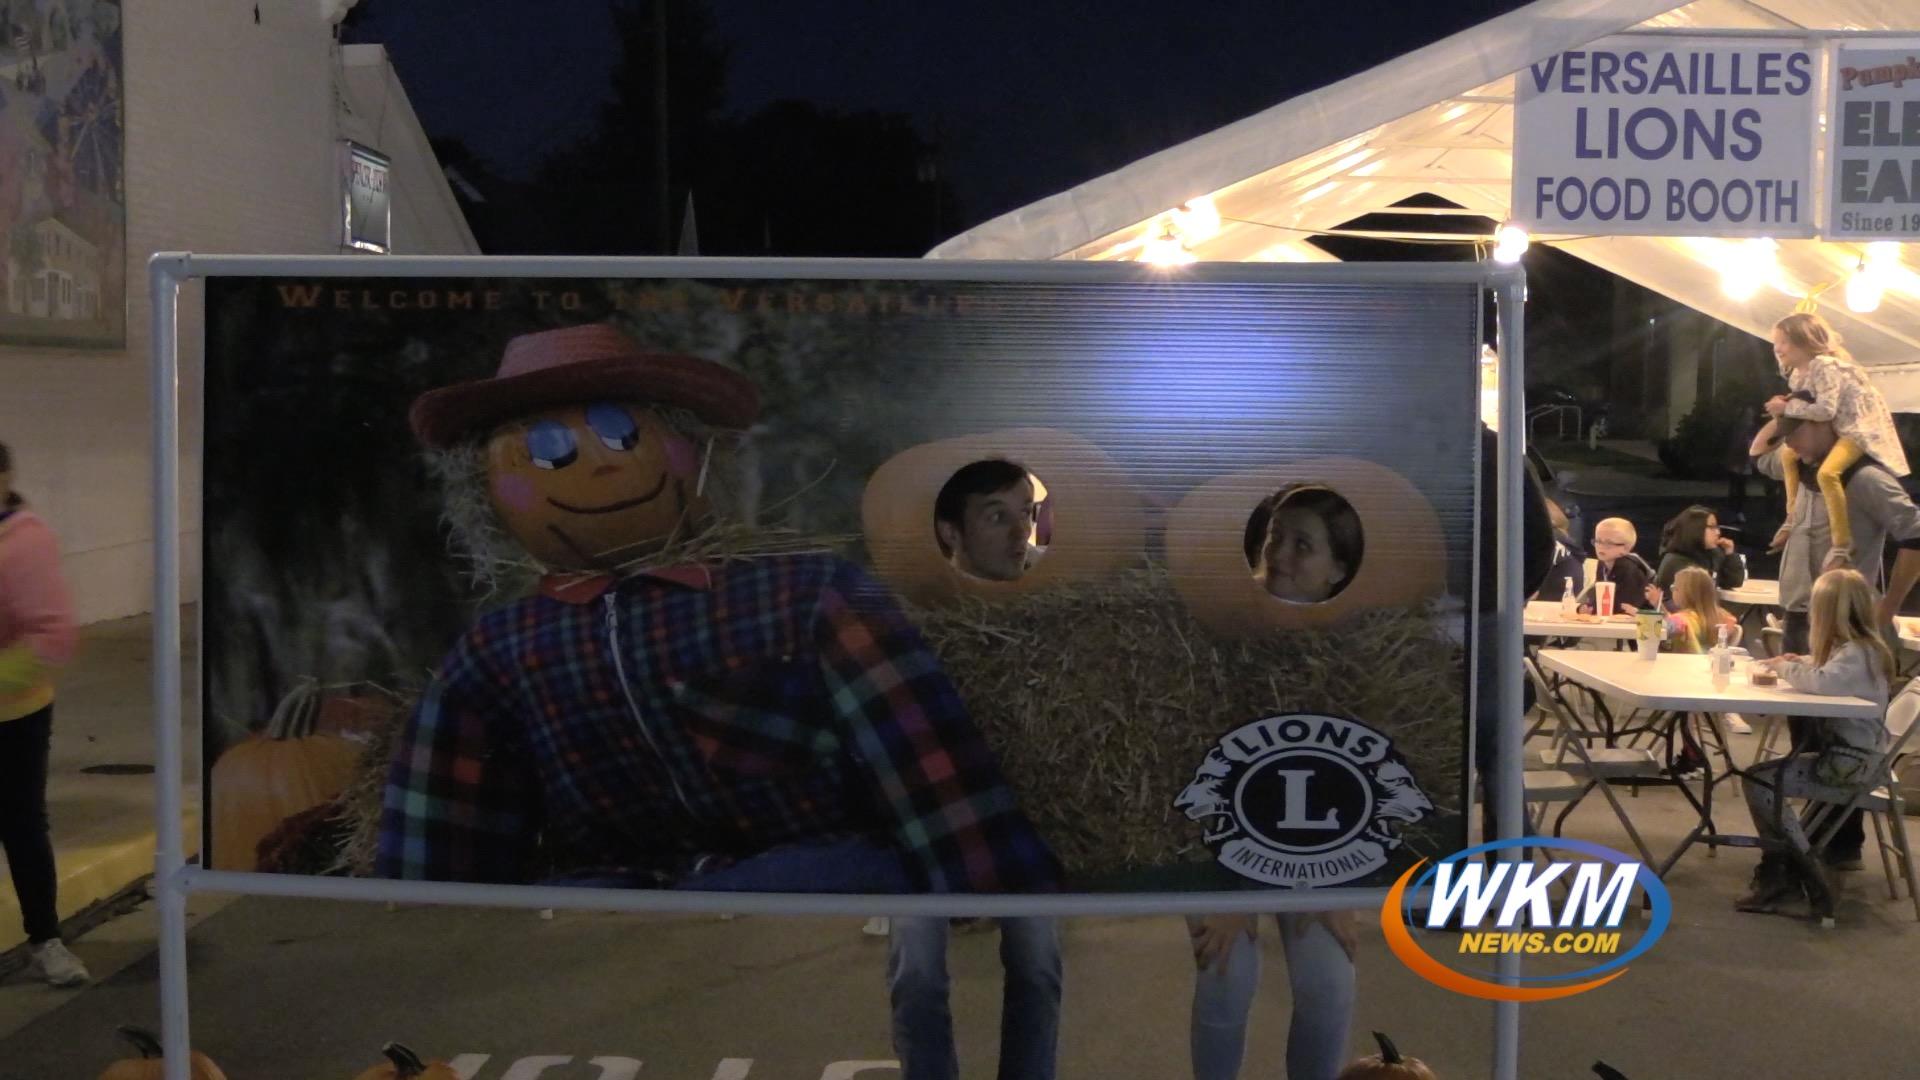 Versailles Pumpkin Show Rings in the Fall Season